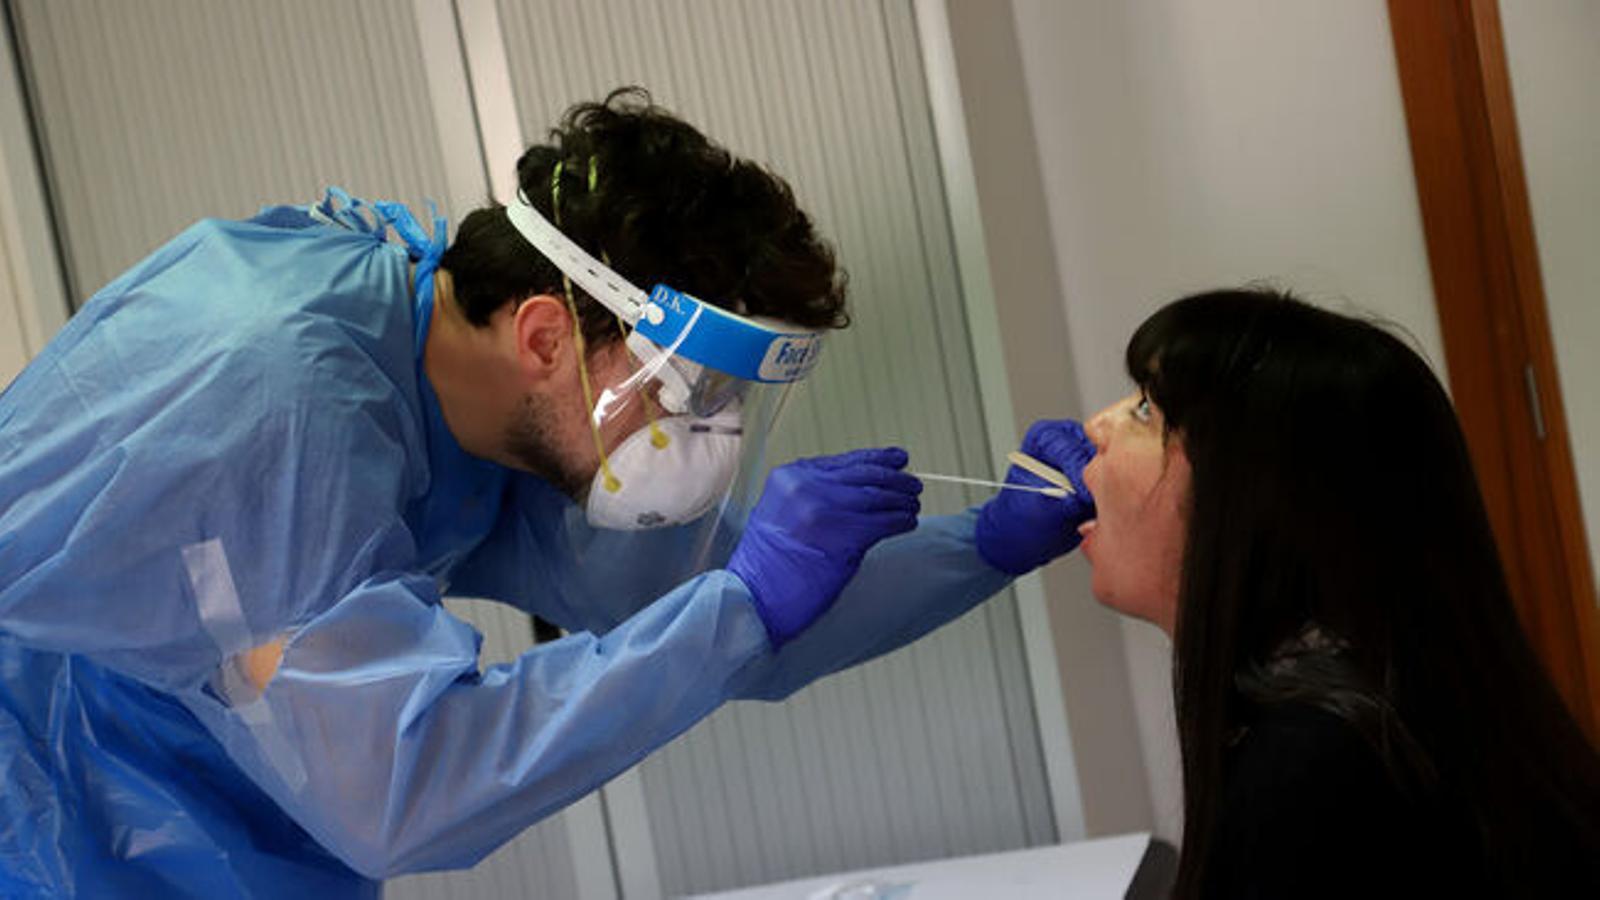 Sanitaris fan proves de detecció del coronavirus. / ISMAEL VELÁZQUEZ